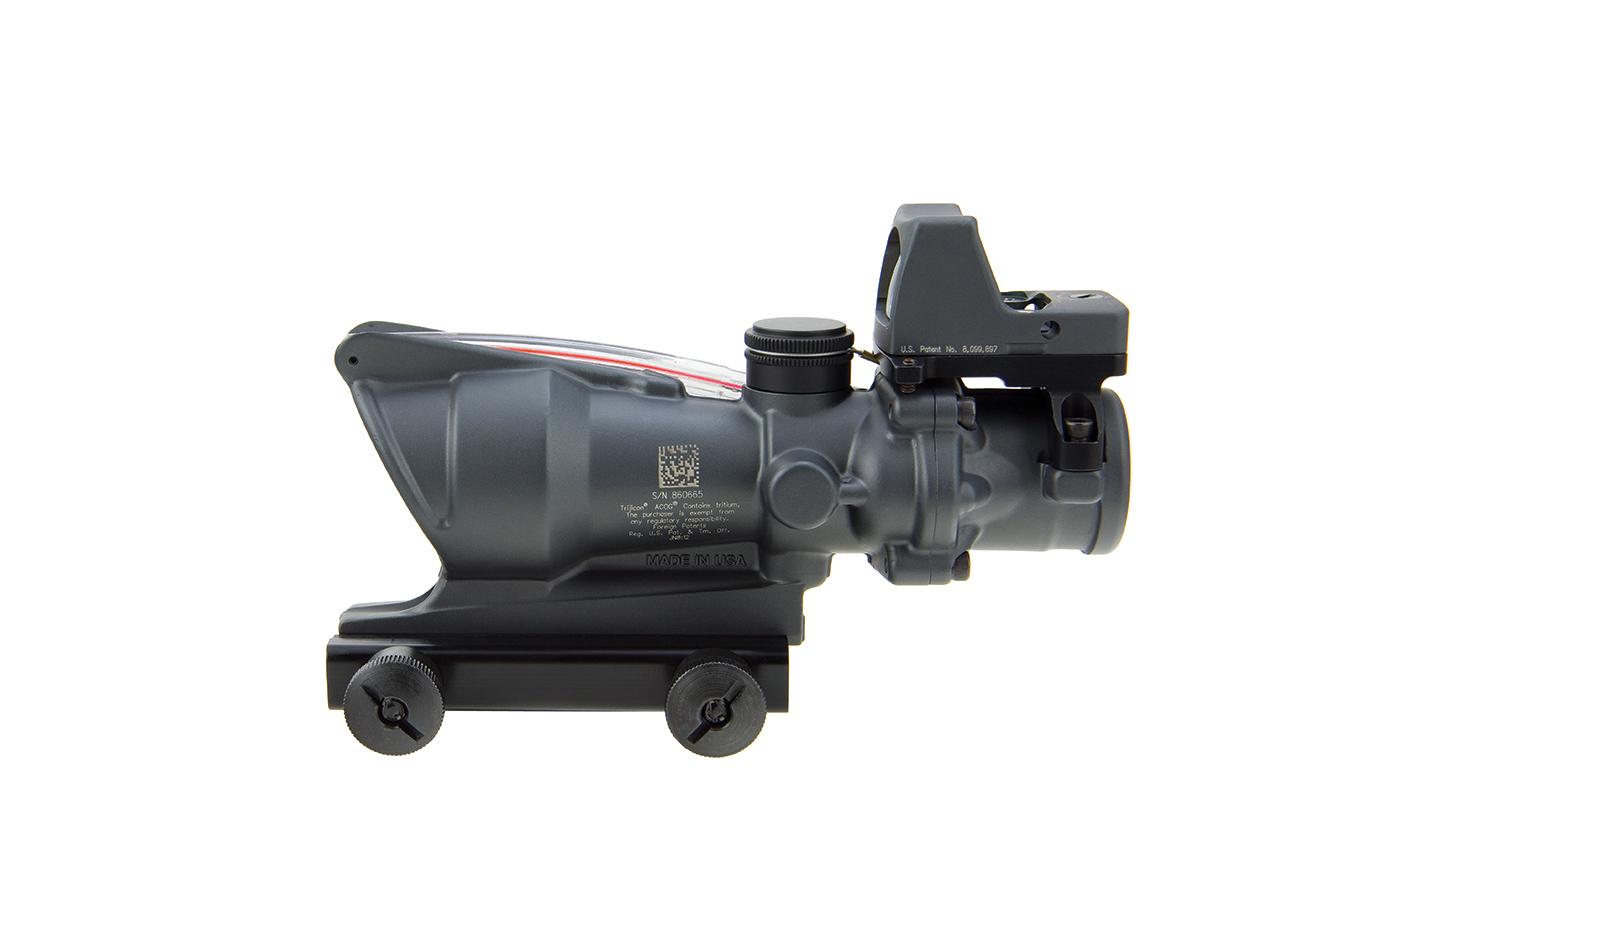 TA31-D-100568 angle 2